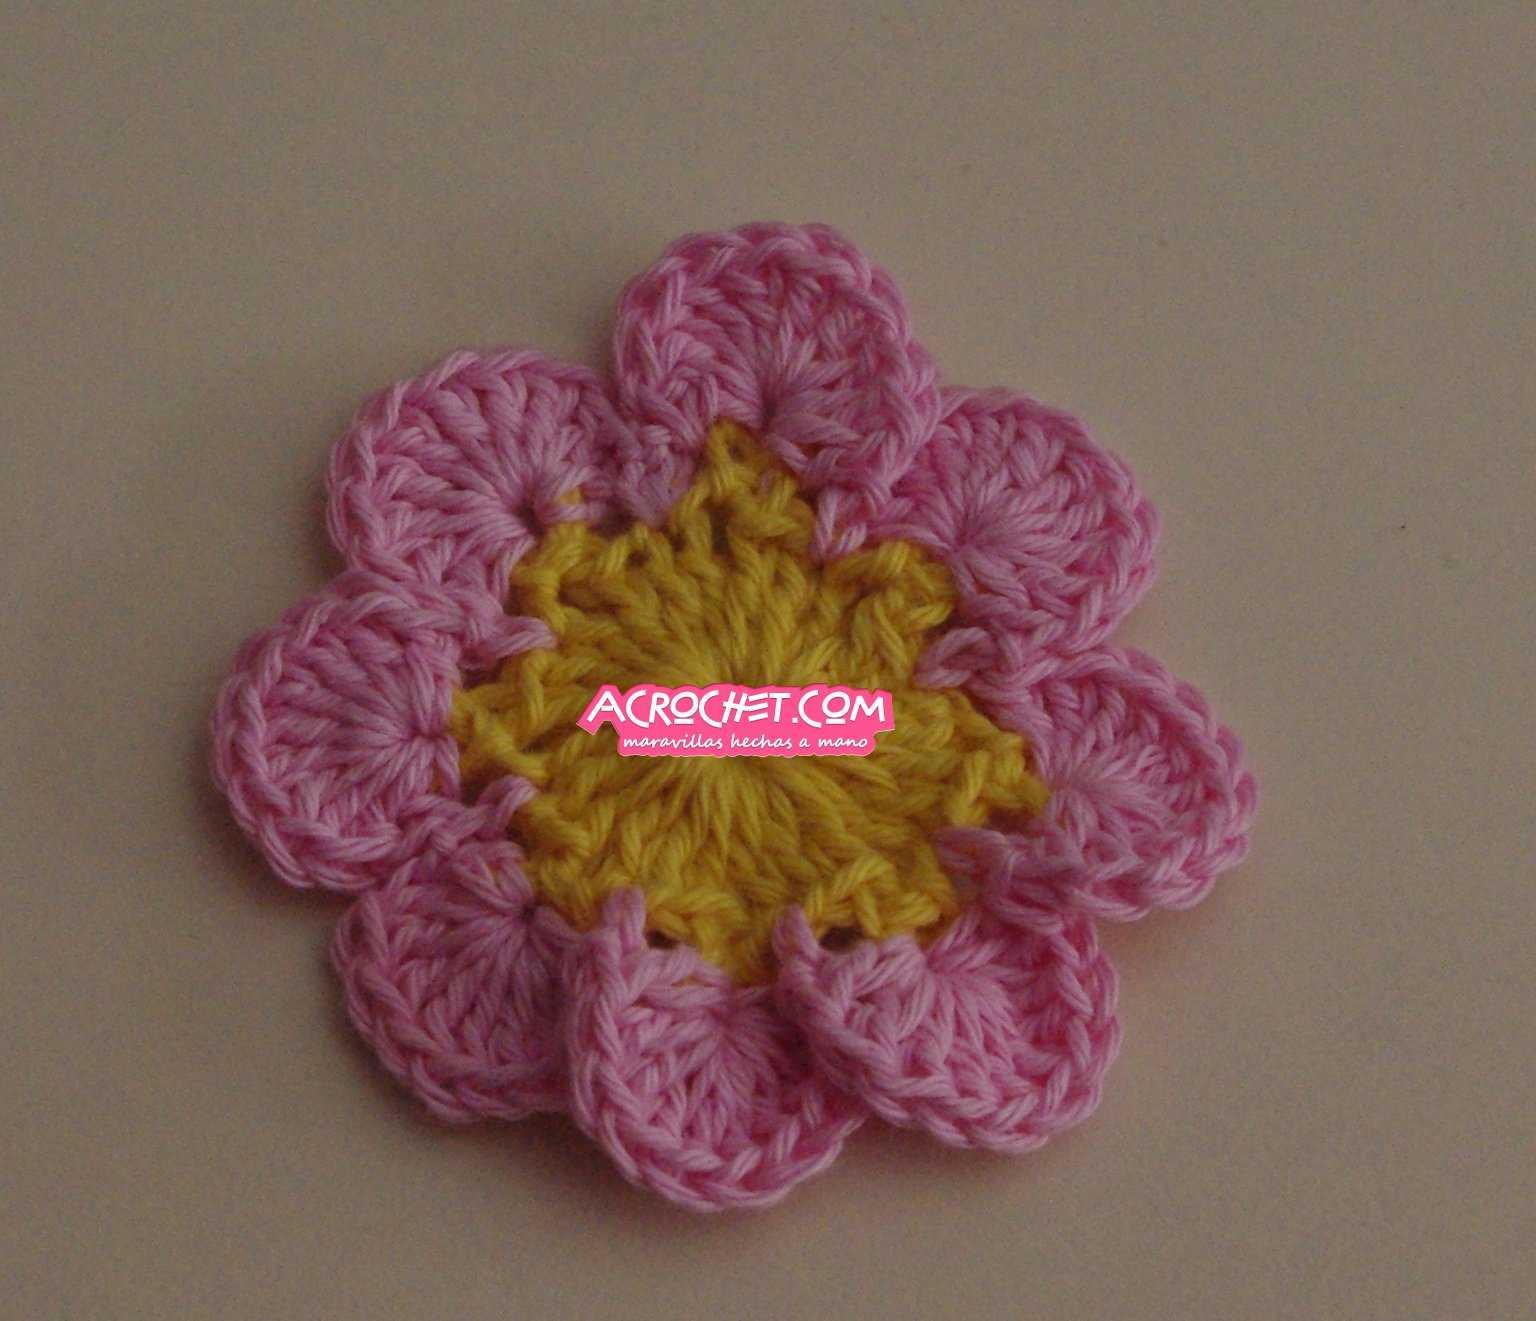 Tags: tejido crochet paso a paso patrones gratis